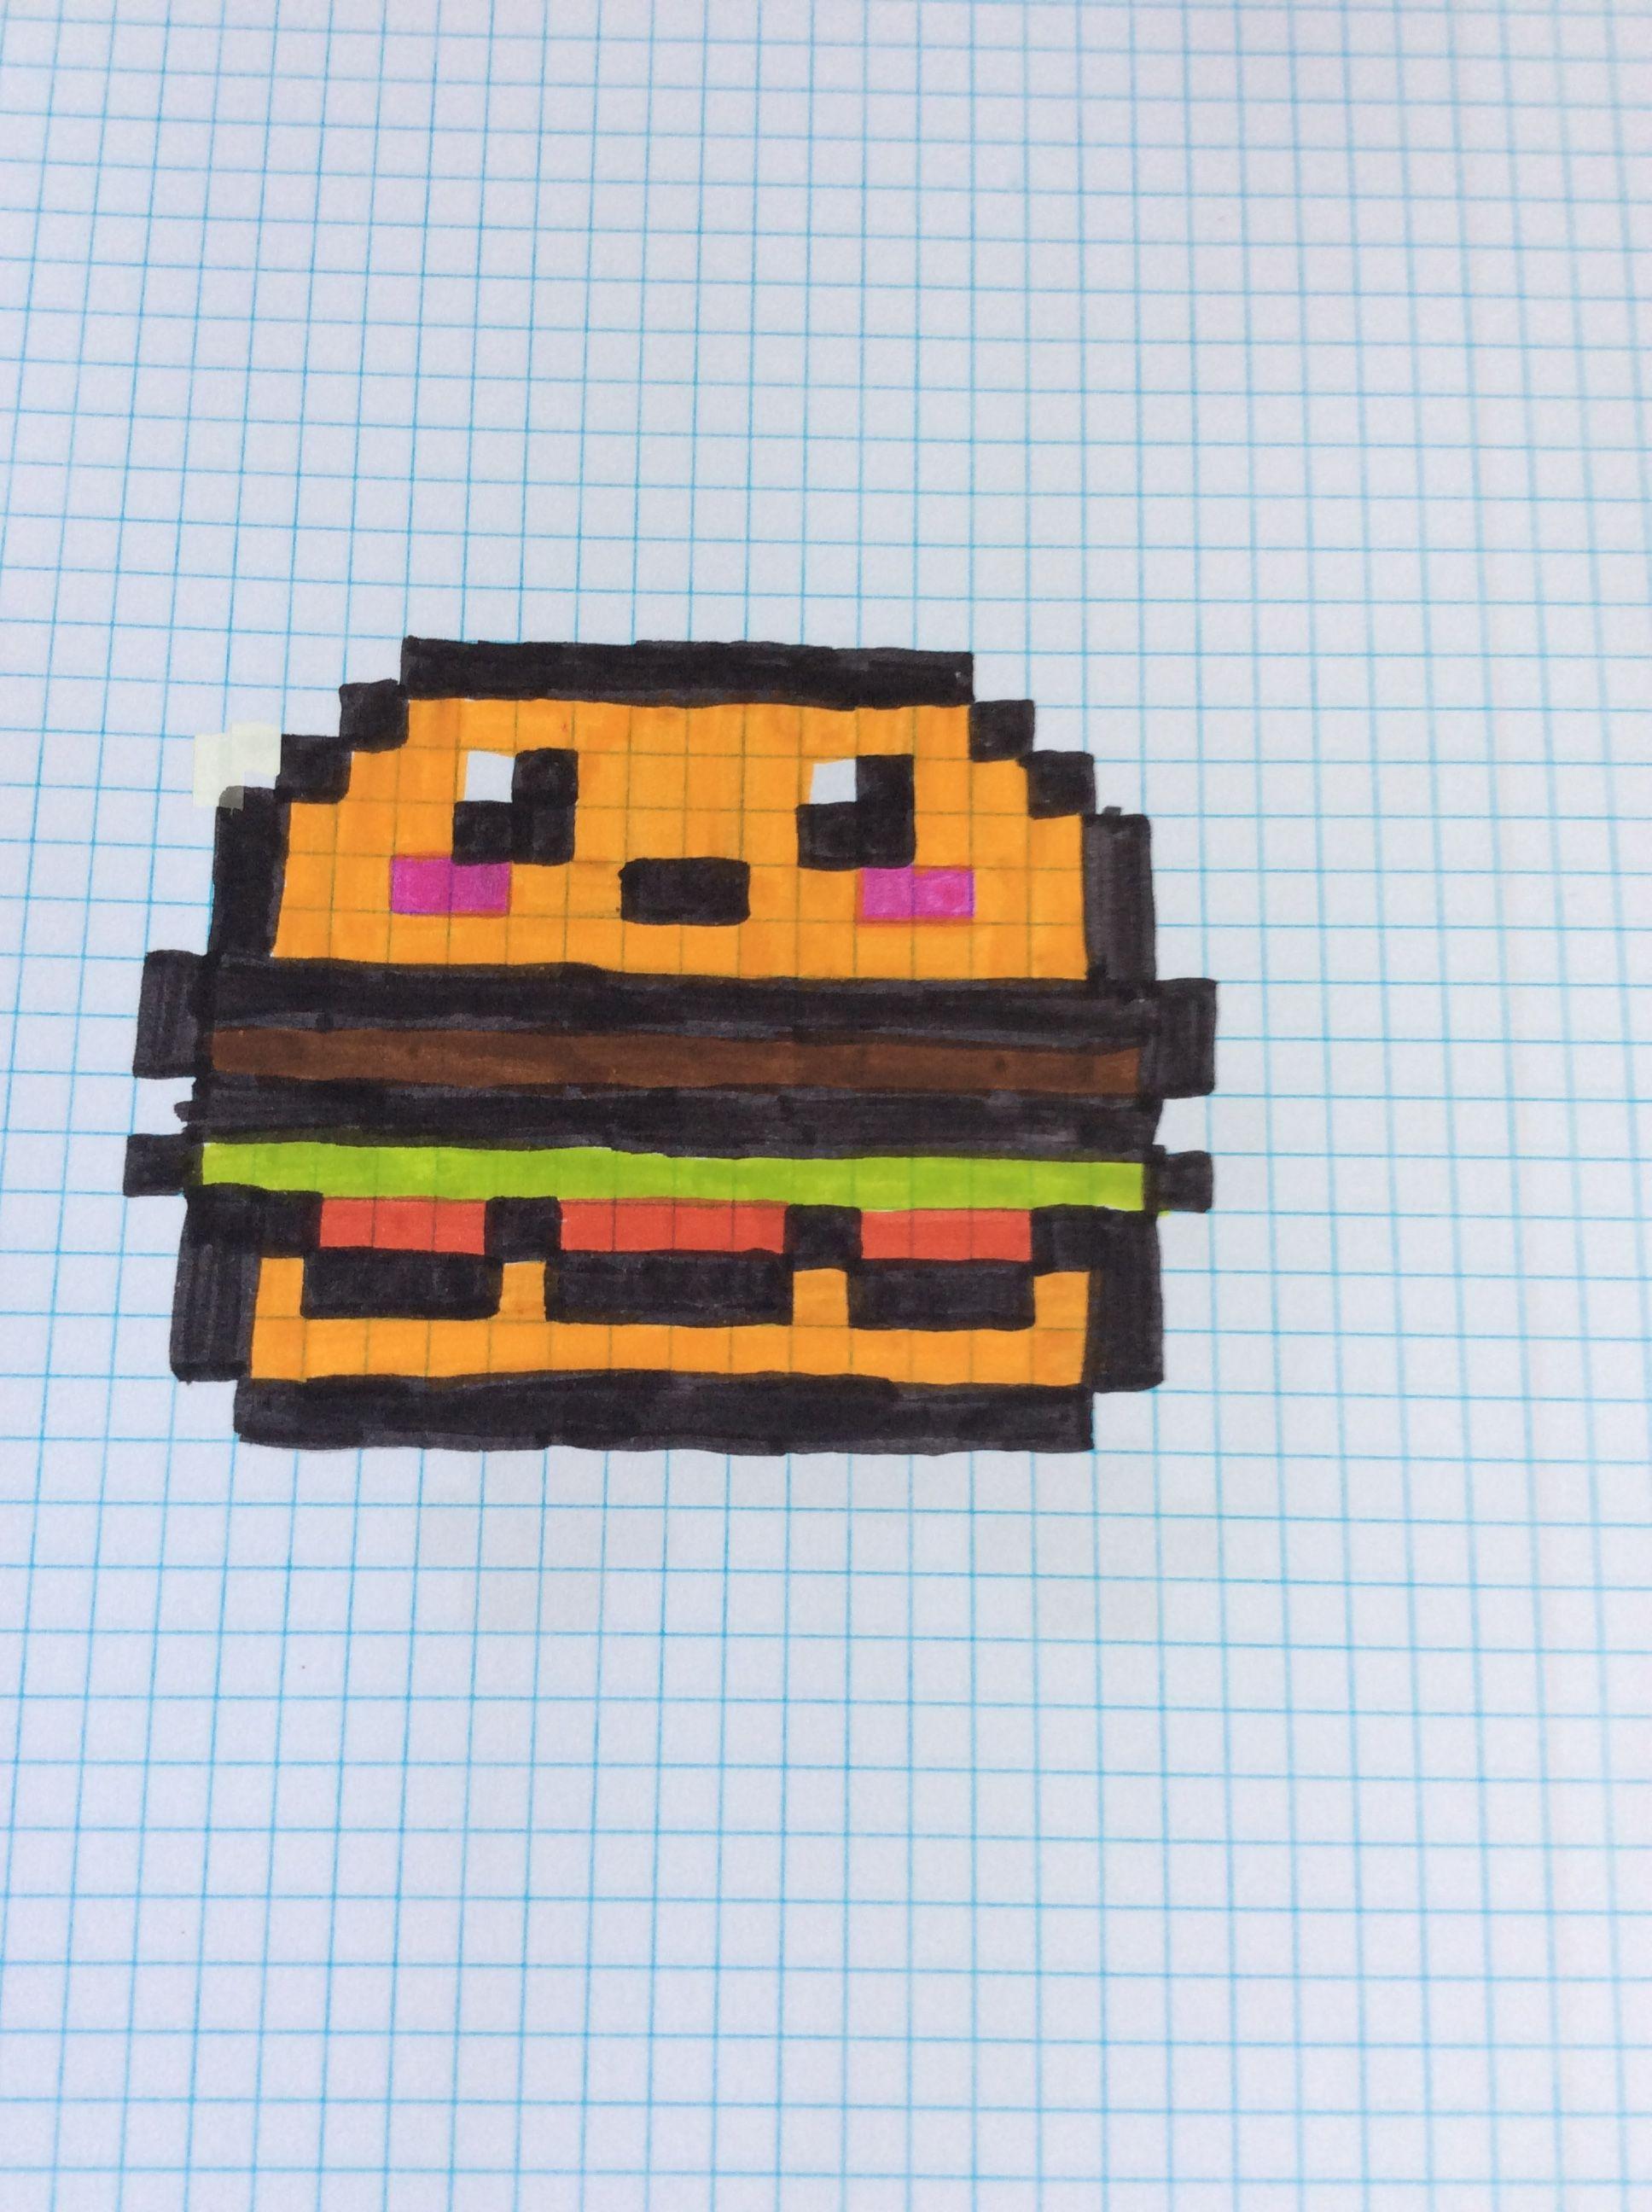 Pixel Art Hamburger Dibujos En Cuadricula Dibujos Pixelados